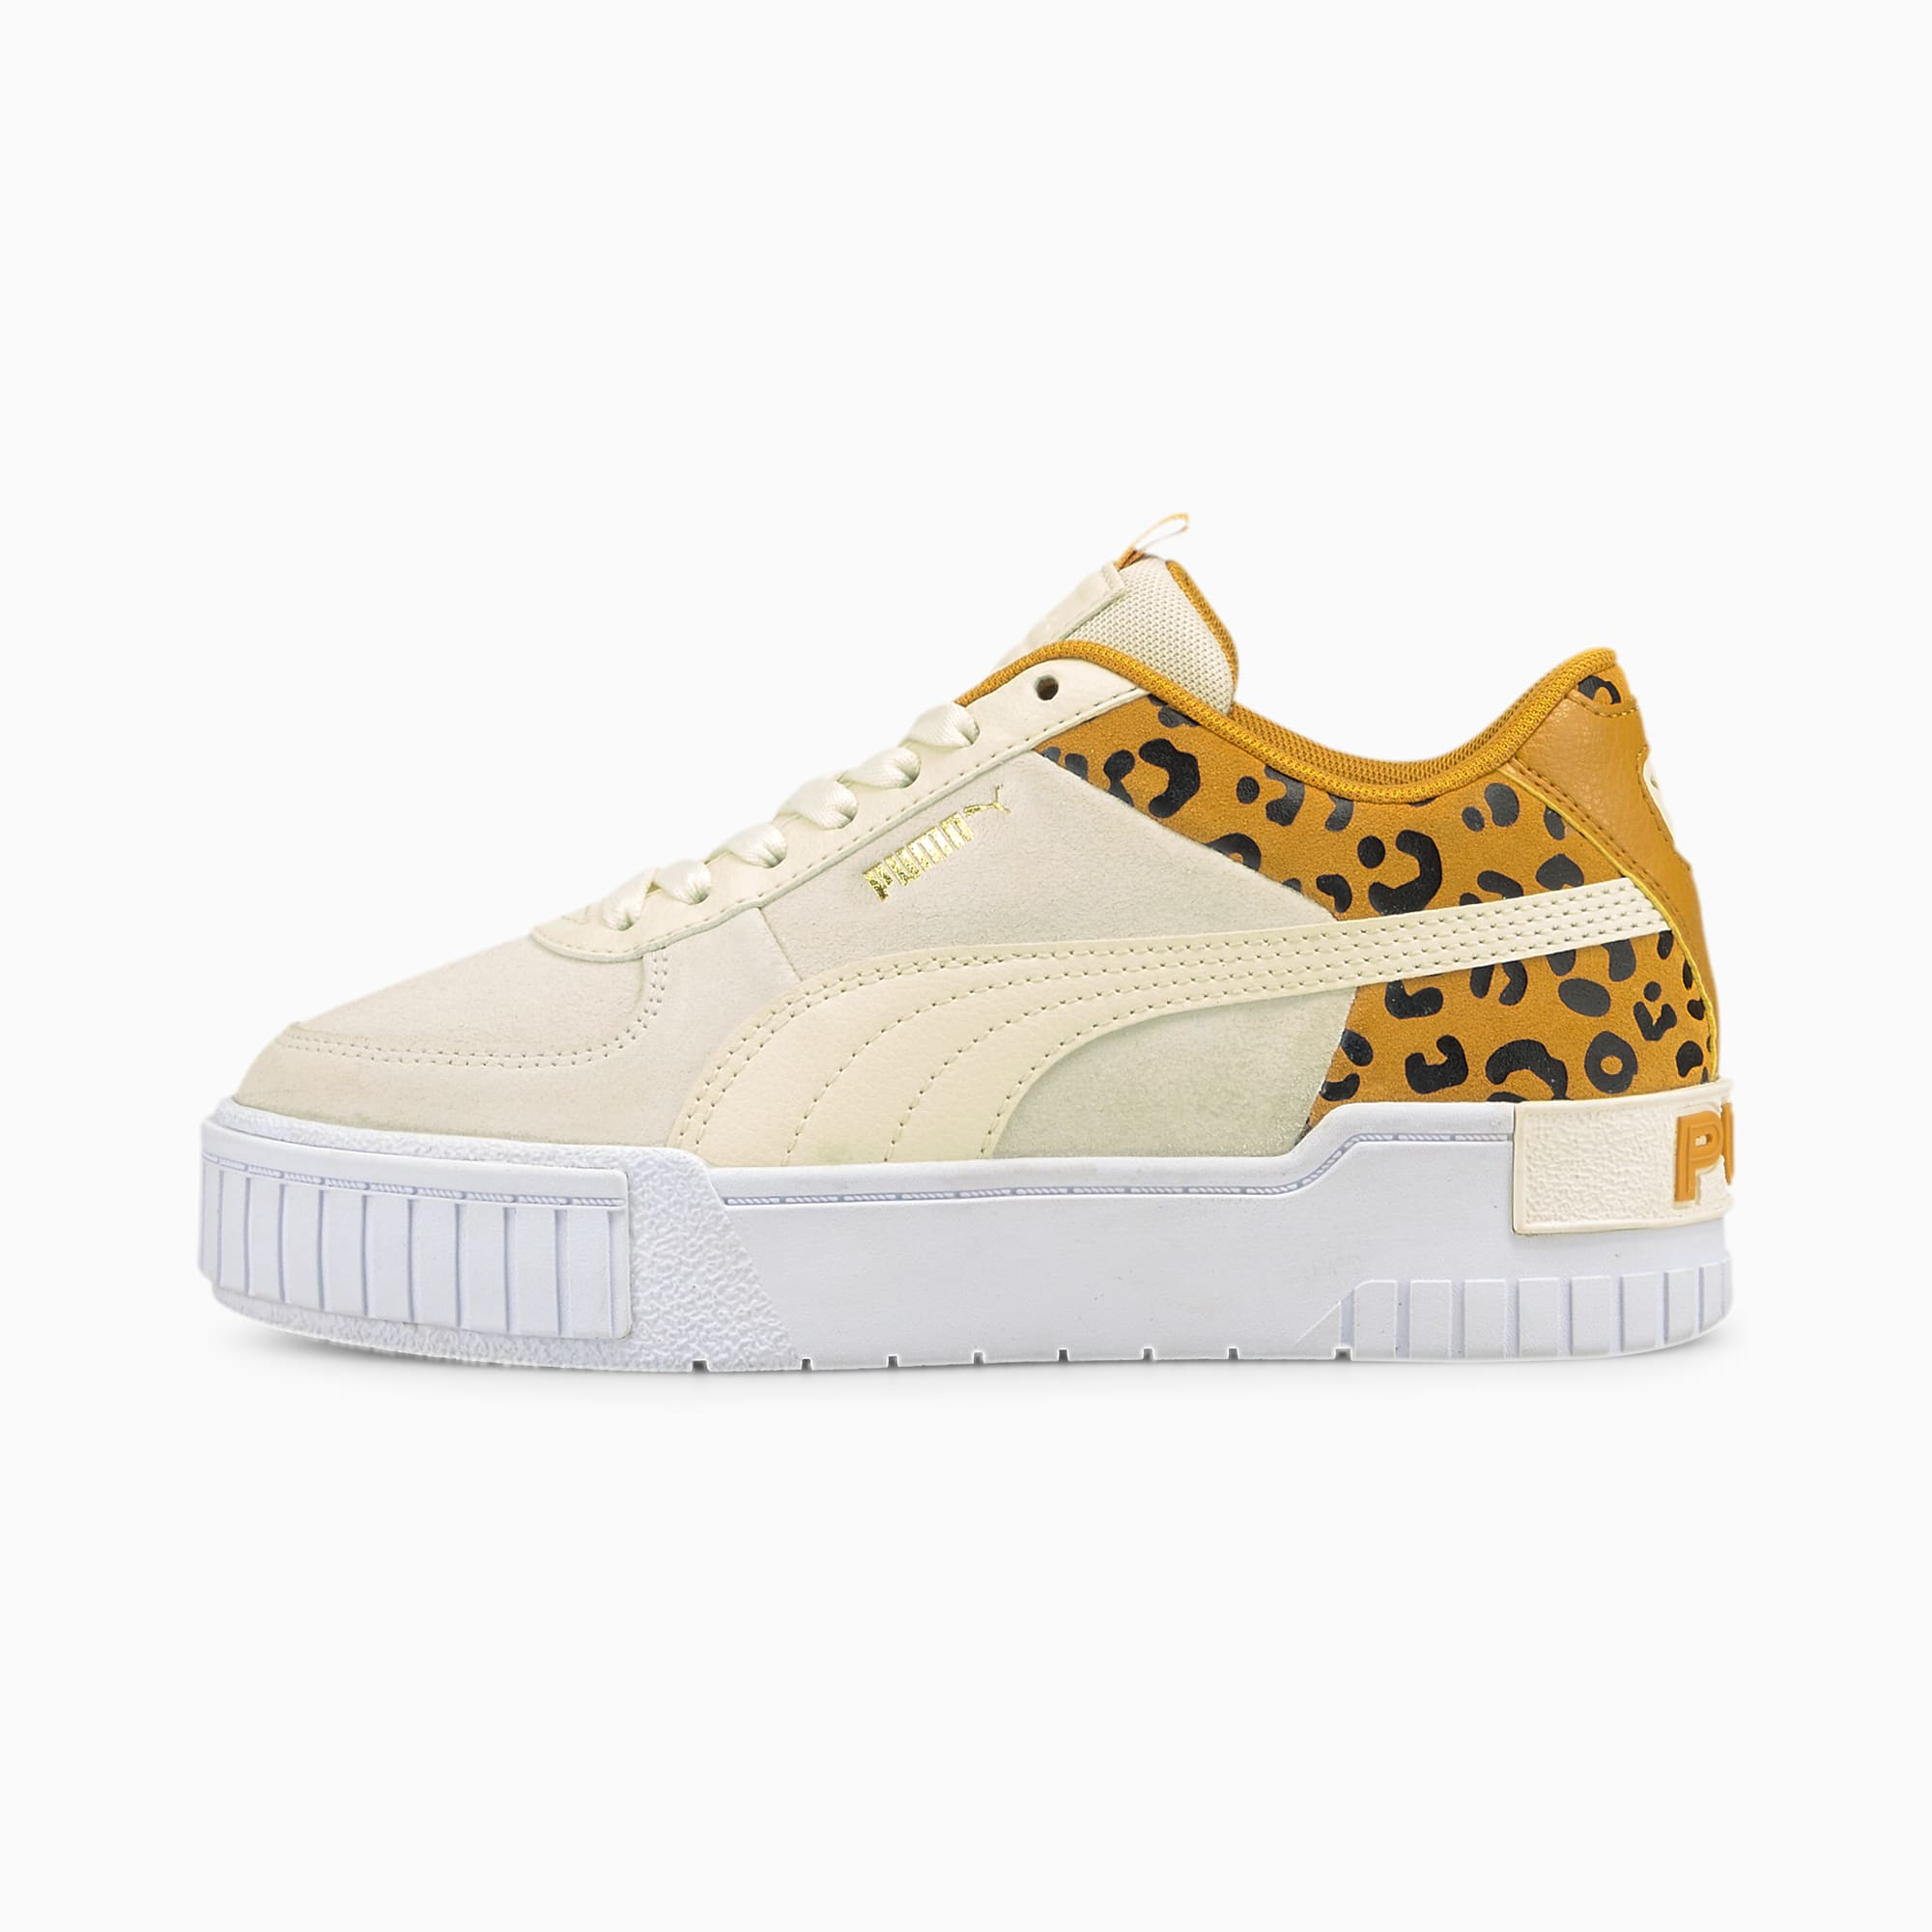 PUMA Cali Sport Roar Jugend Sneaker Schuhe Für Kinder | Mehrfarbig | Größe: 38.5